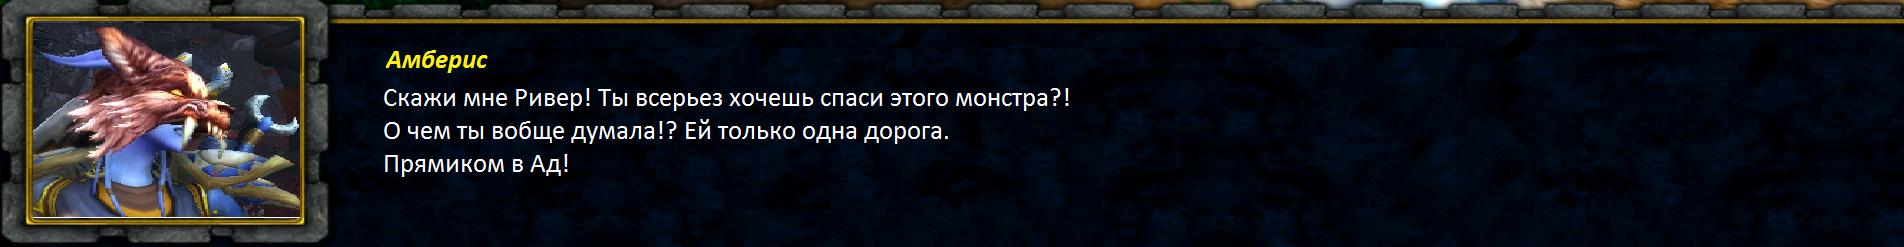 диалог Шаман 9 эпизод 05